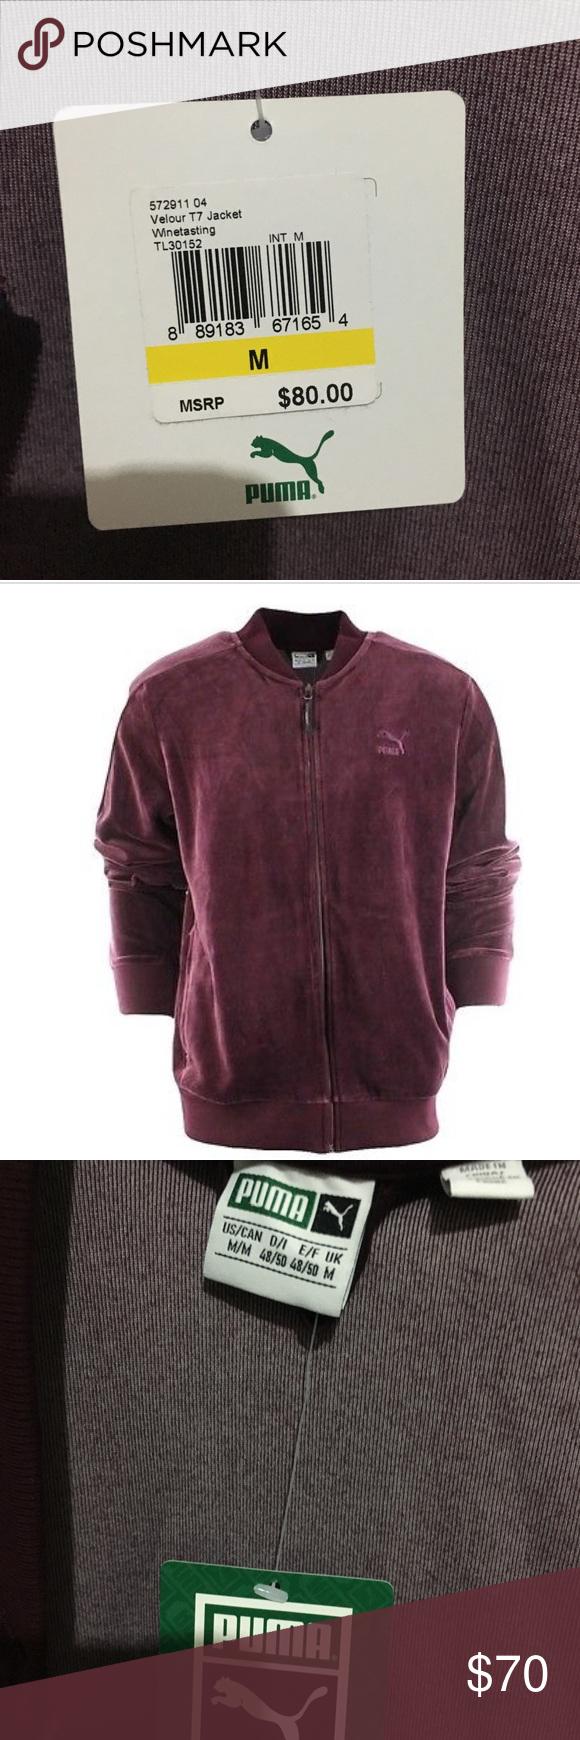 Velour t puma jacket plum color never worn velvet material puma